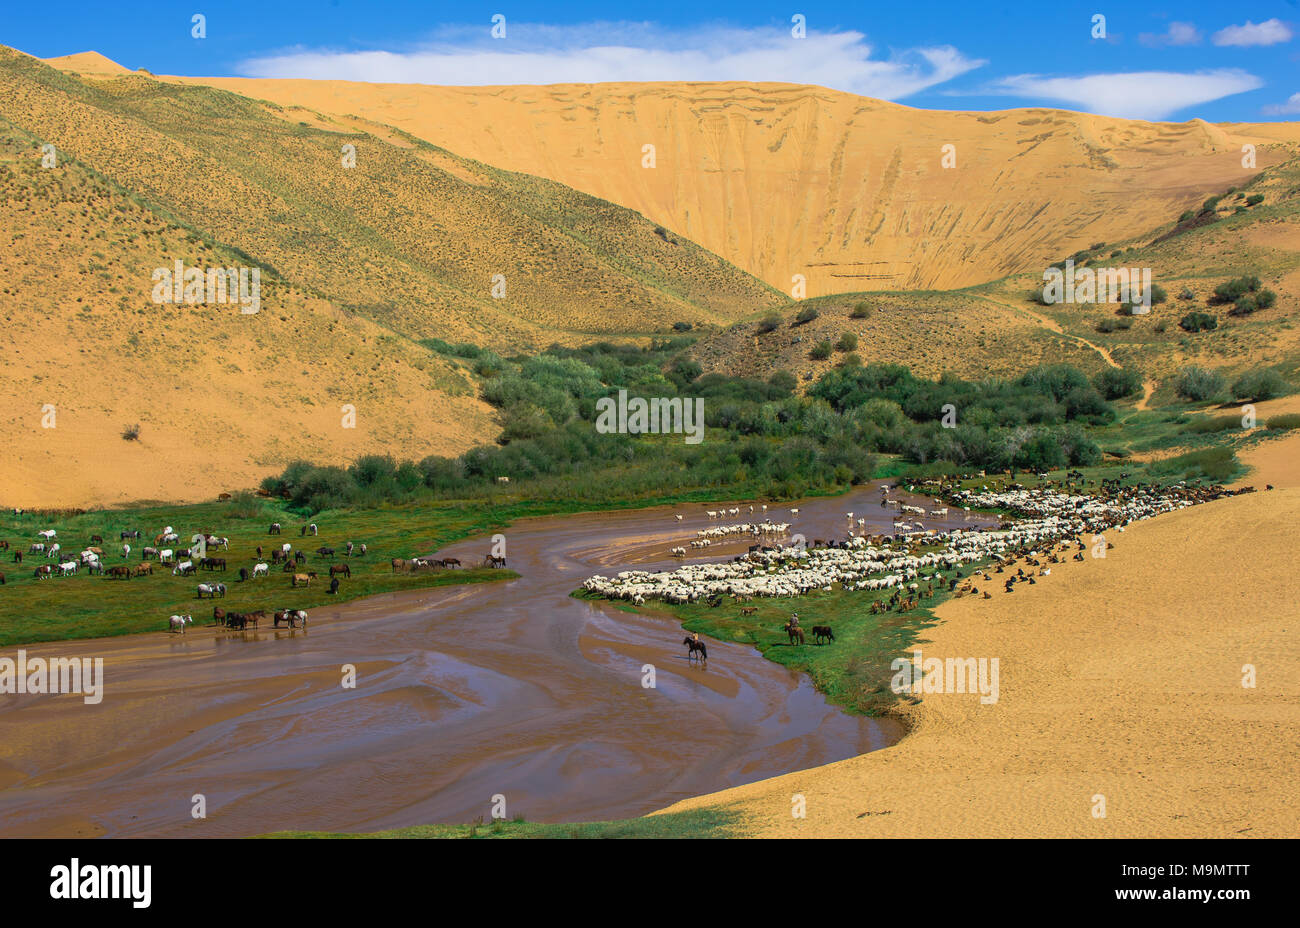 Baga-Nariin-Gol, Nariin River, Mongolia - Stock Image